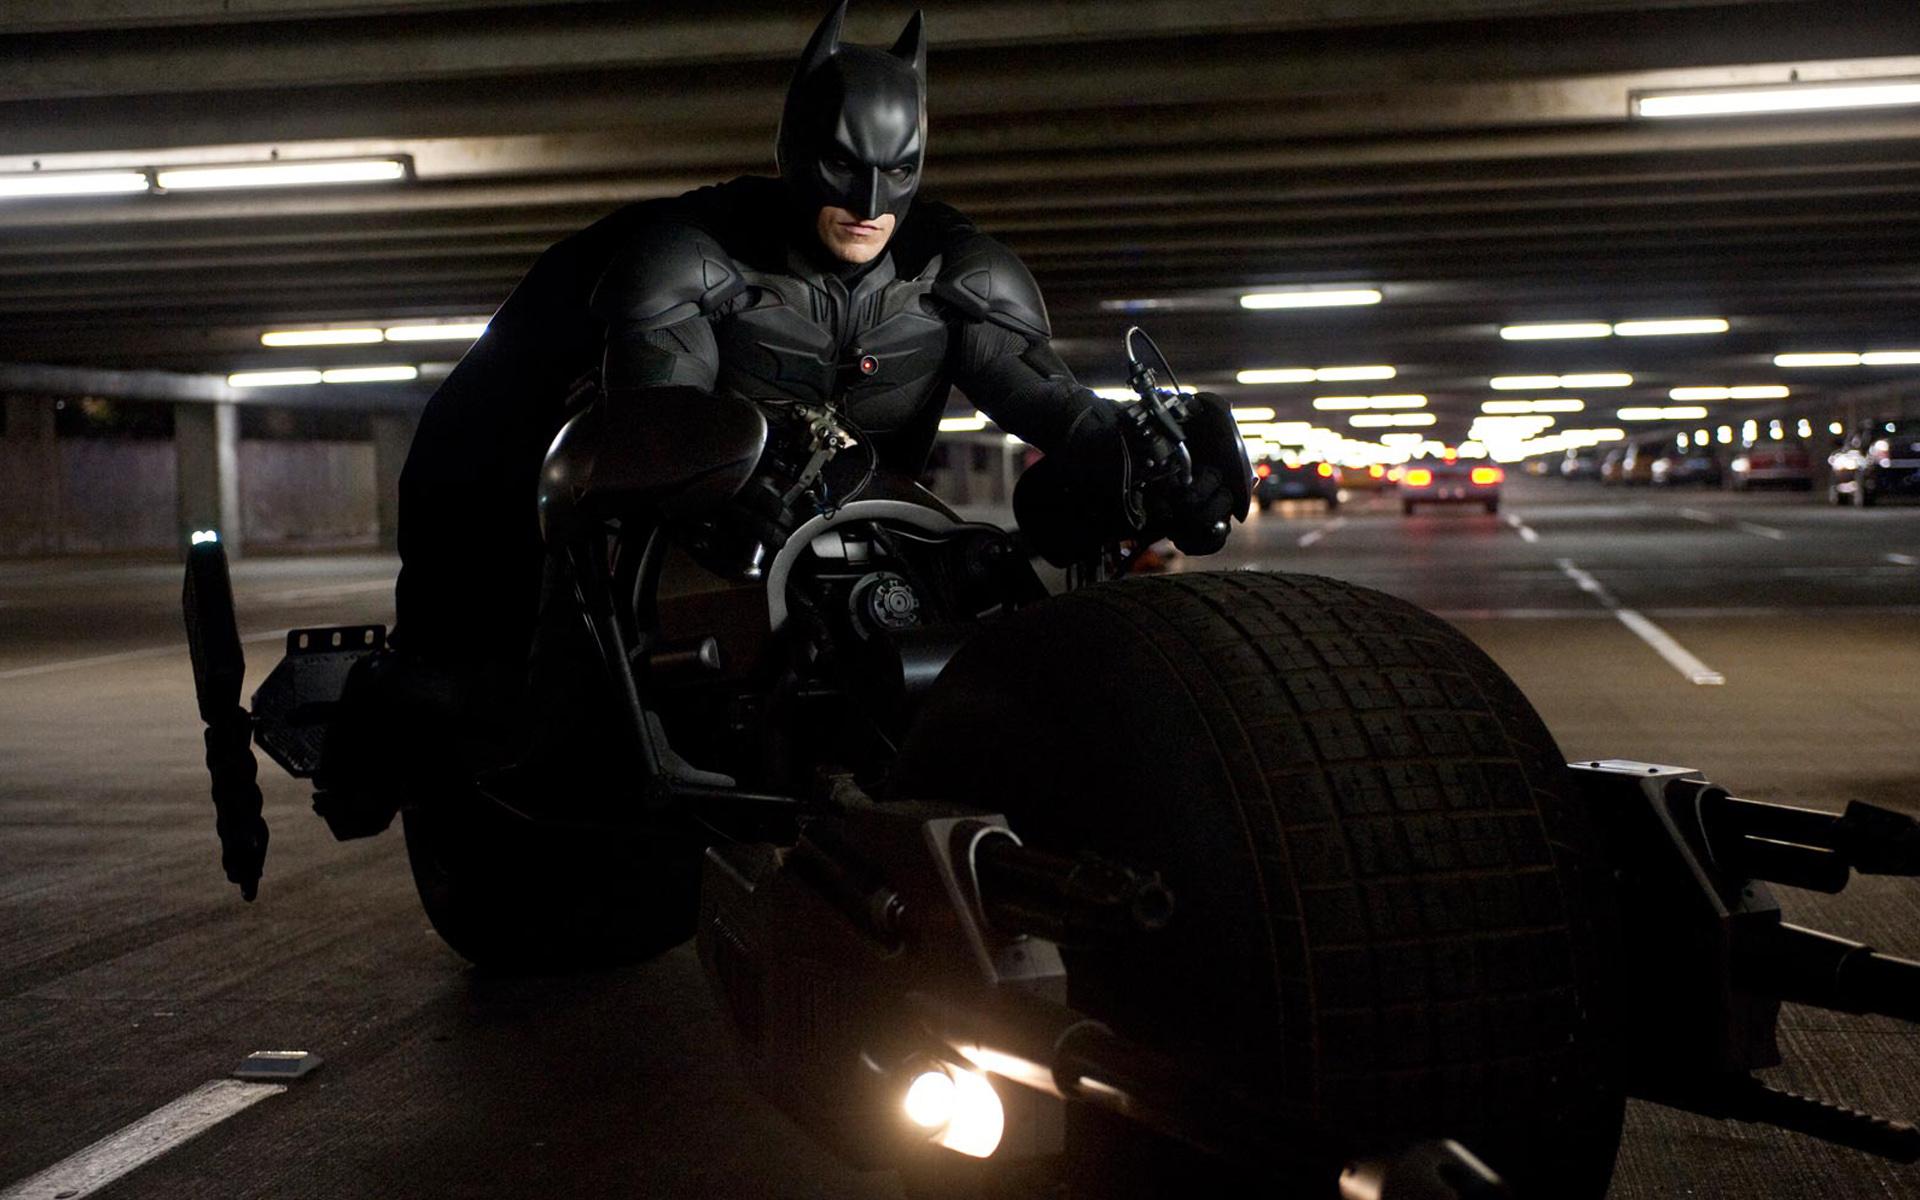 The Dark Knight Rises Batman Wallpapers HD Wallpapers 1920x1200